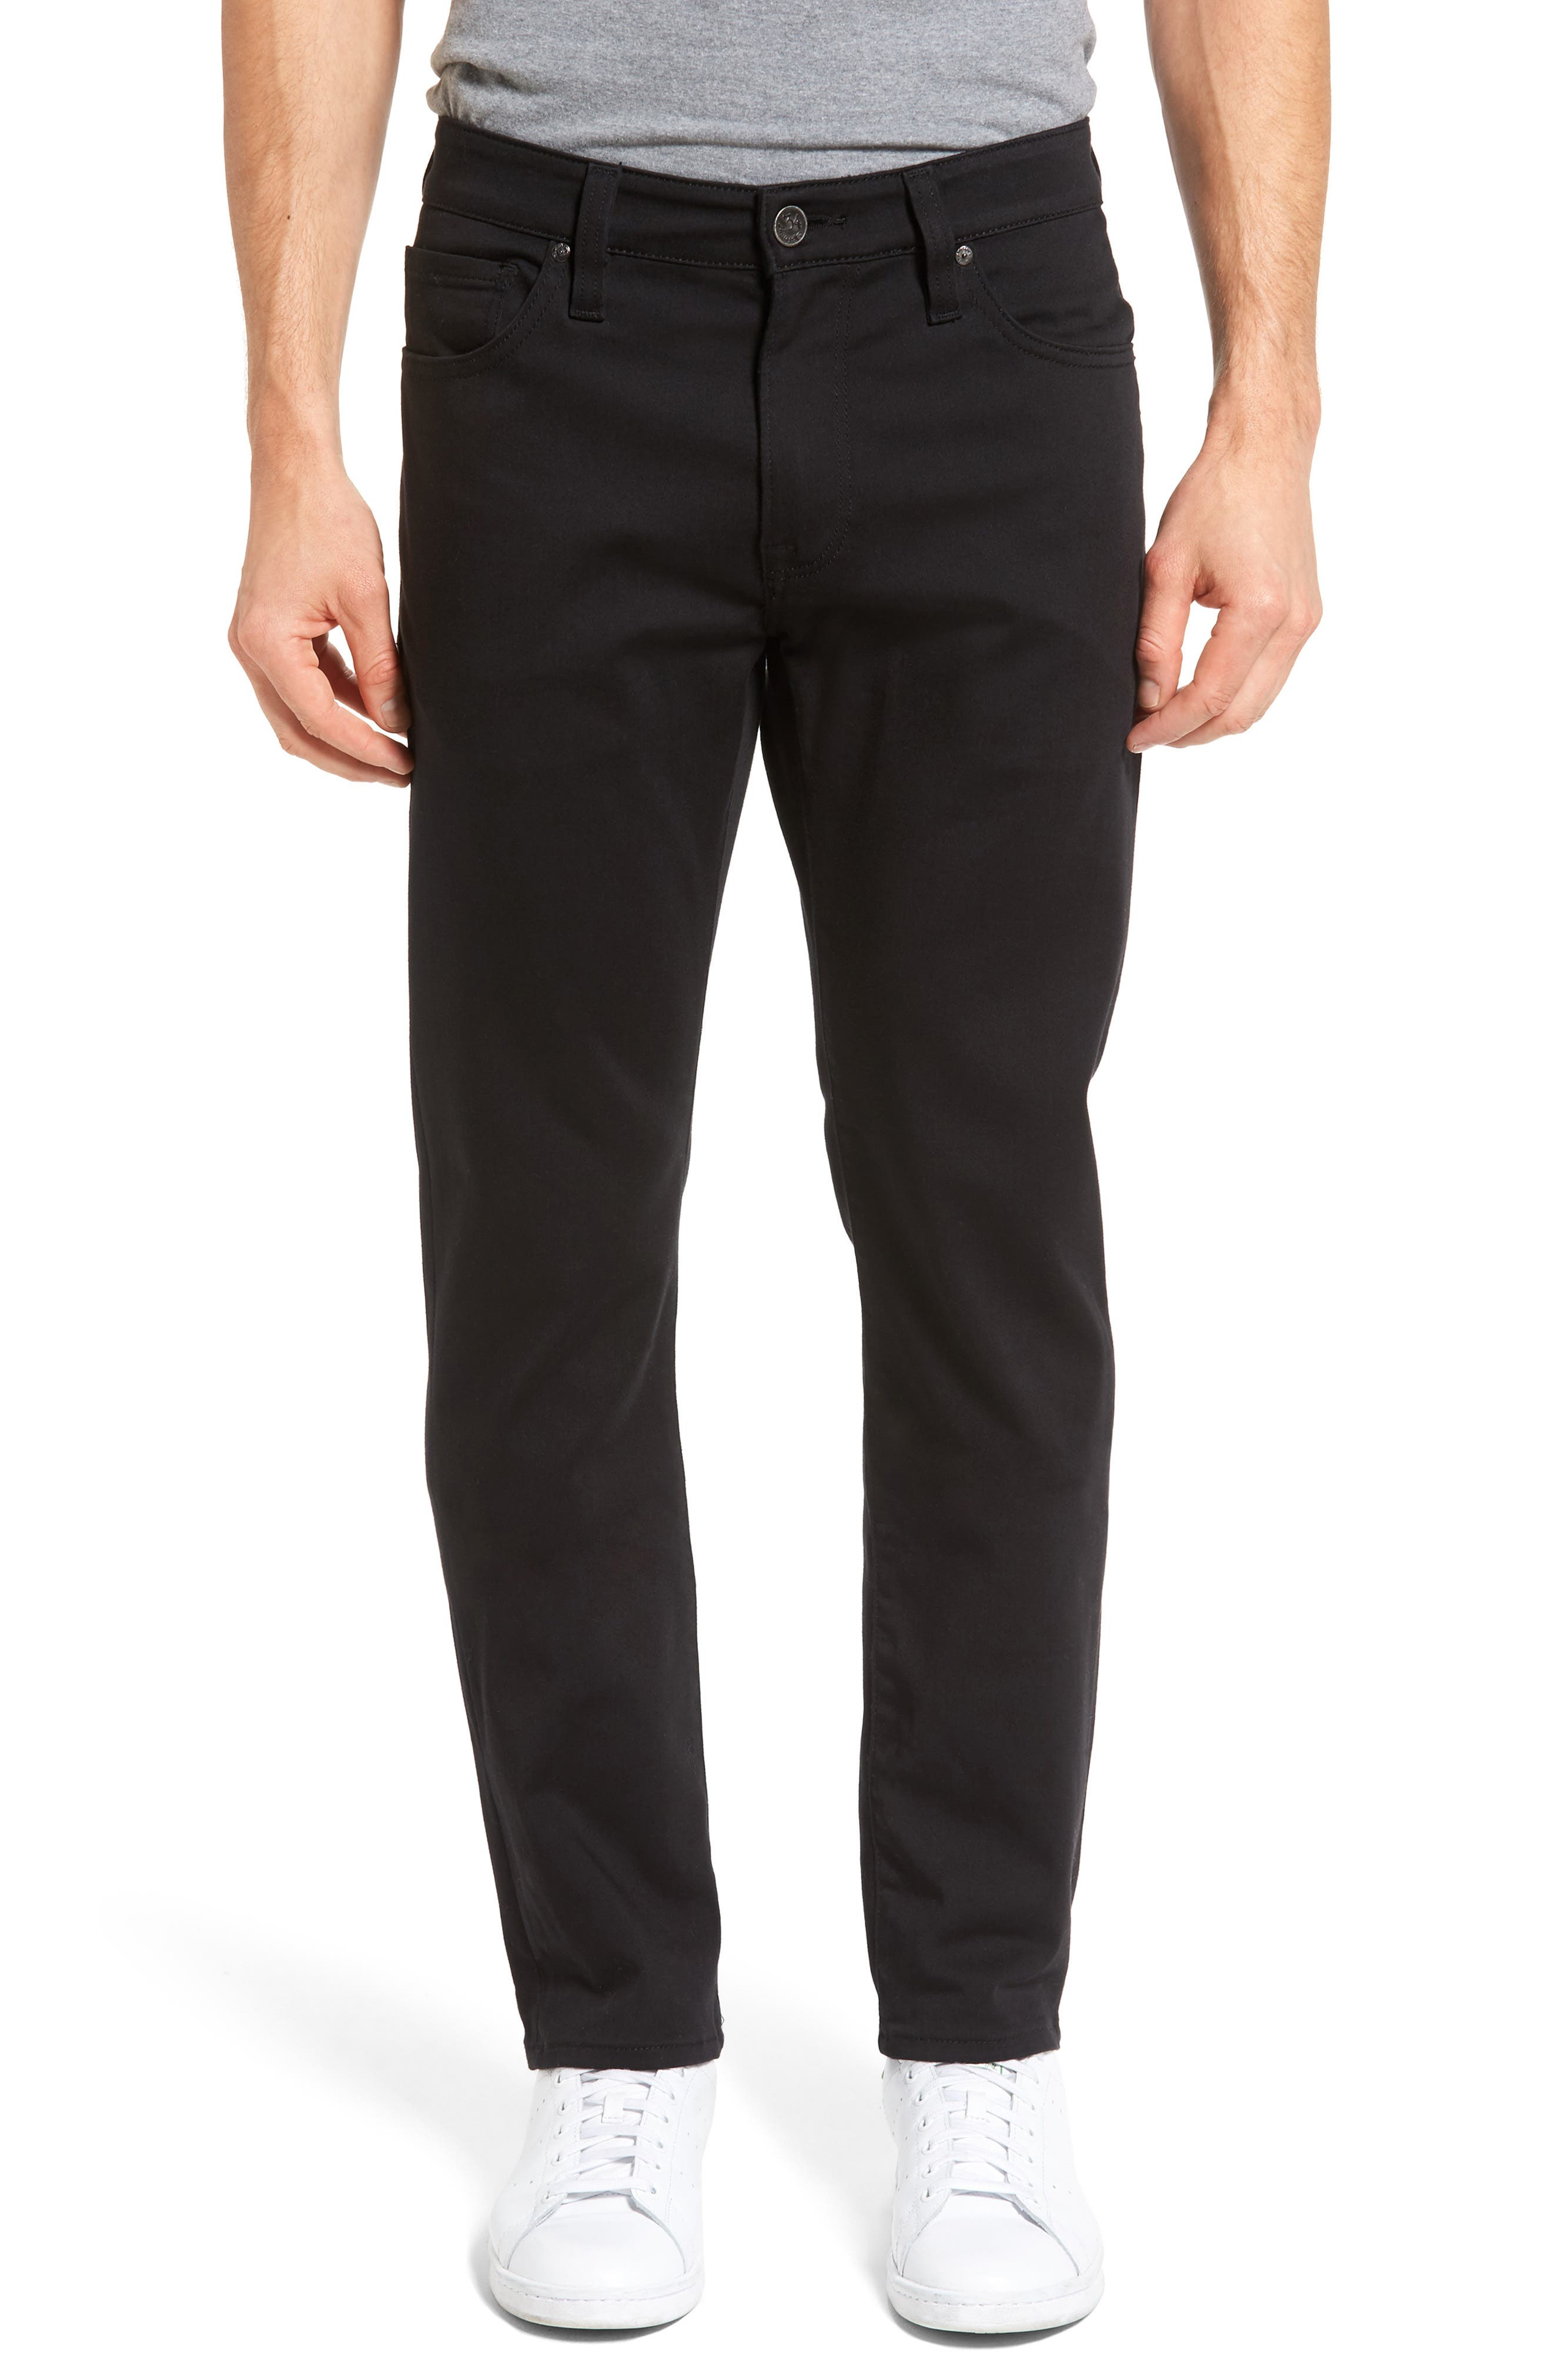 Courage Straight Leg Jeans,                             Main thumbnail 1, color,                             SELECT DOUBLE BLACK